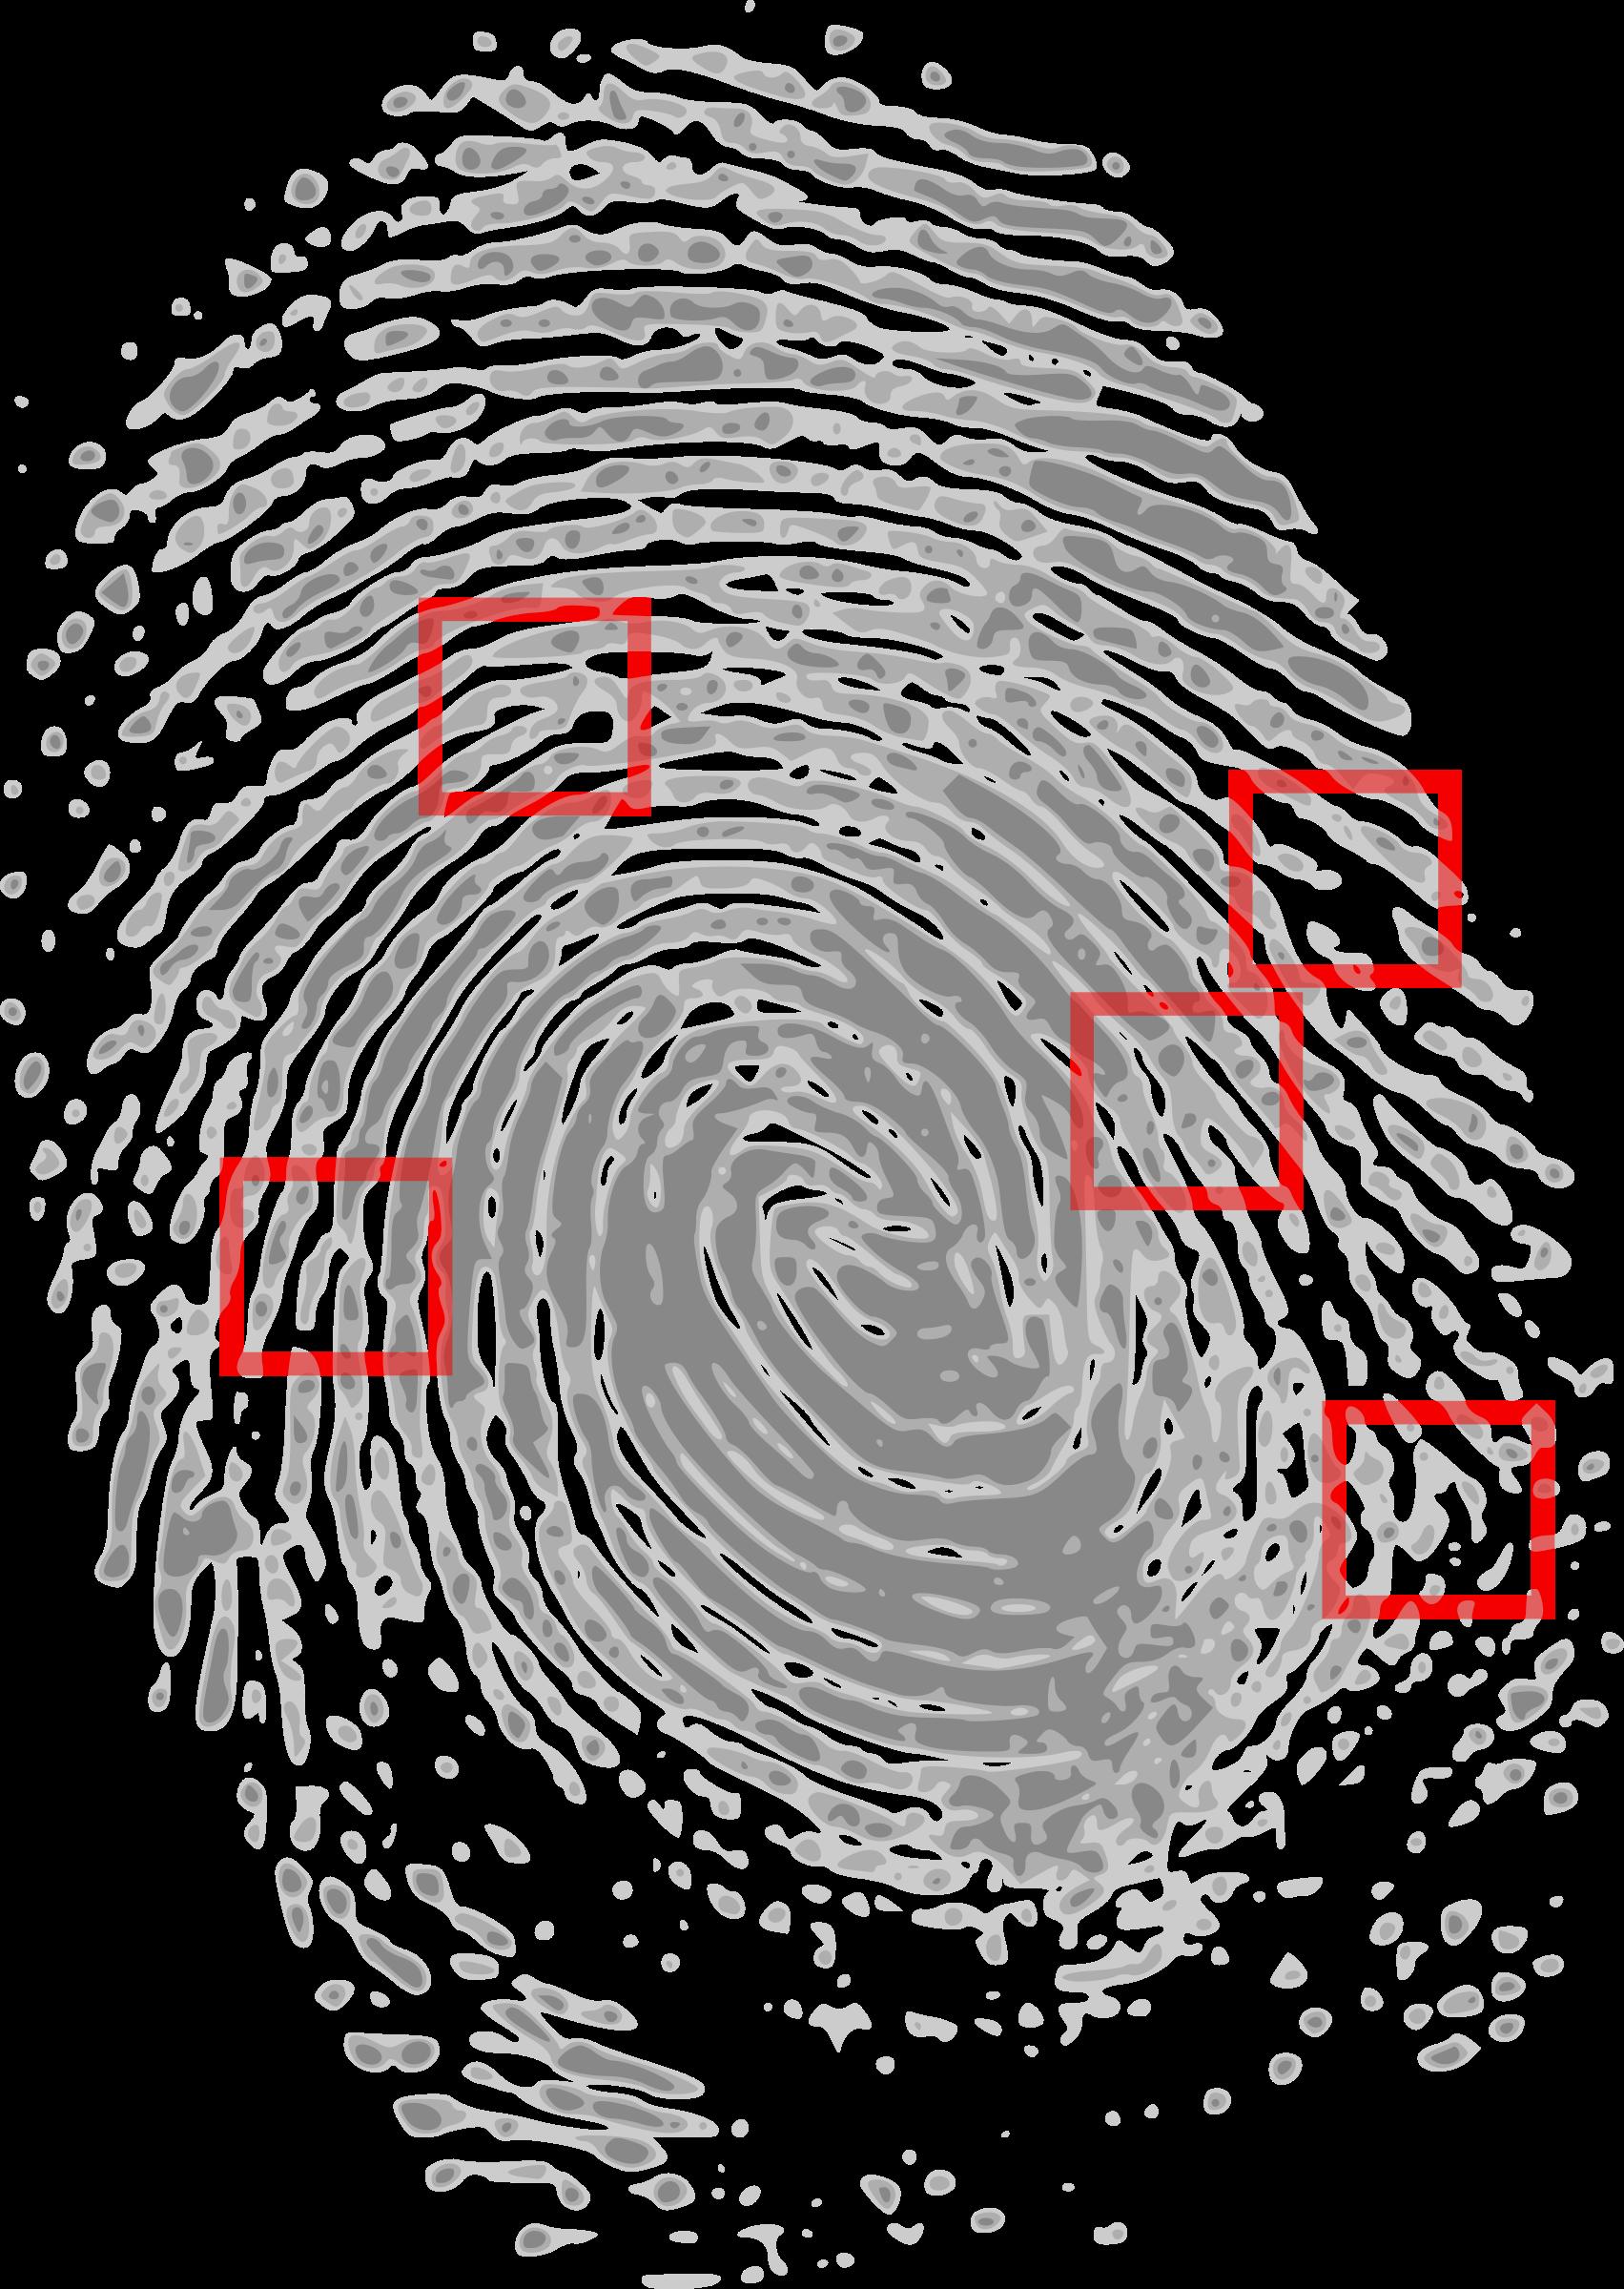 Fingerprint clear background free. Fingers clipart thumbmark